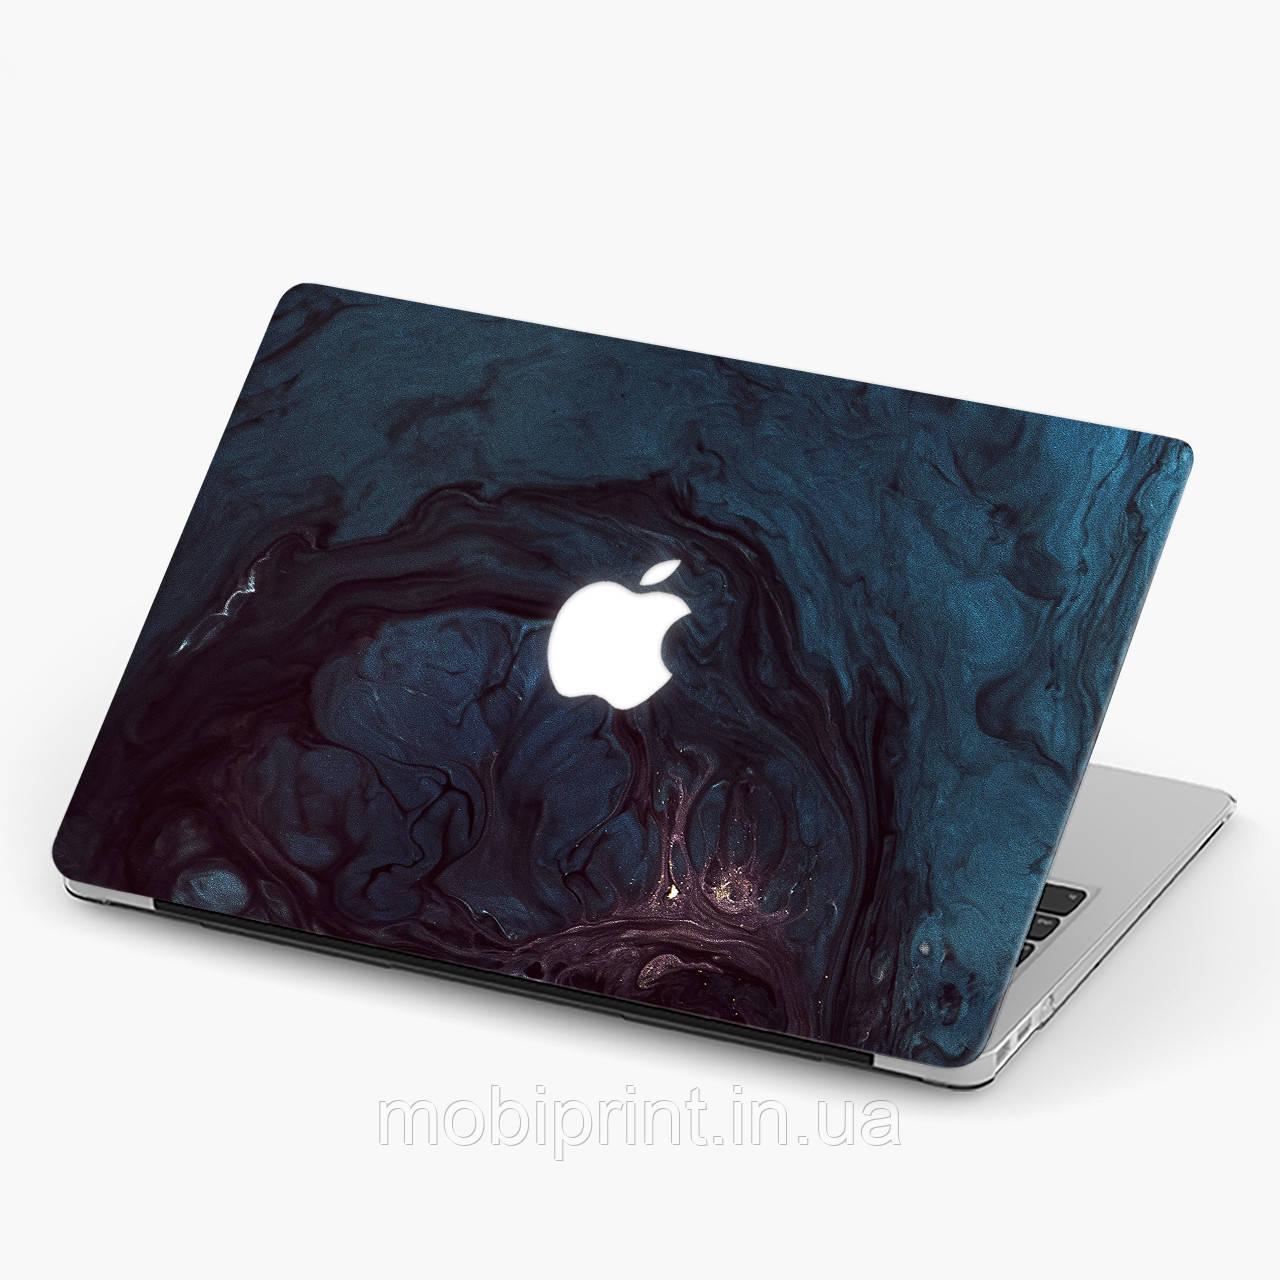 Чехол пластиковый для Apple MacBook Pro / Air Темно-синий мрамор (Dark blue marble) макбук про case hard cover